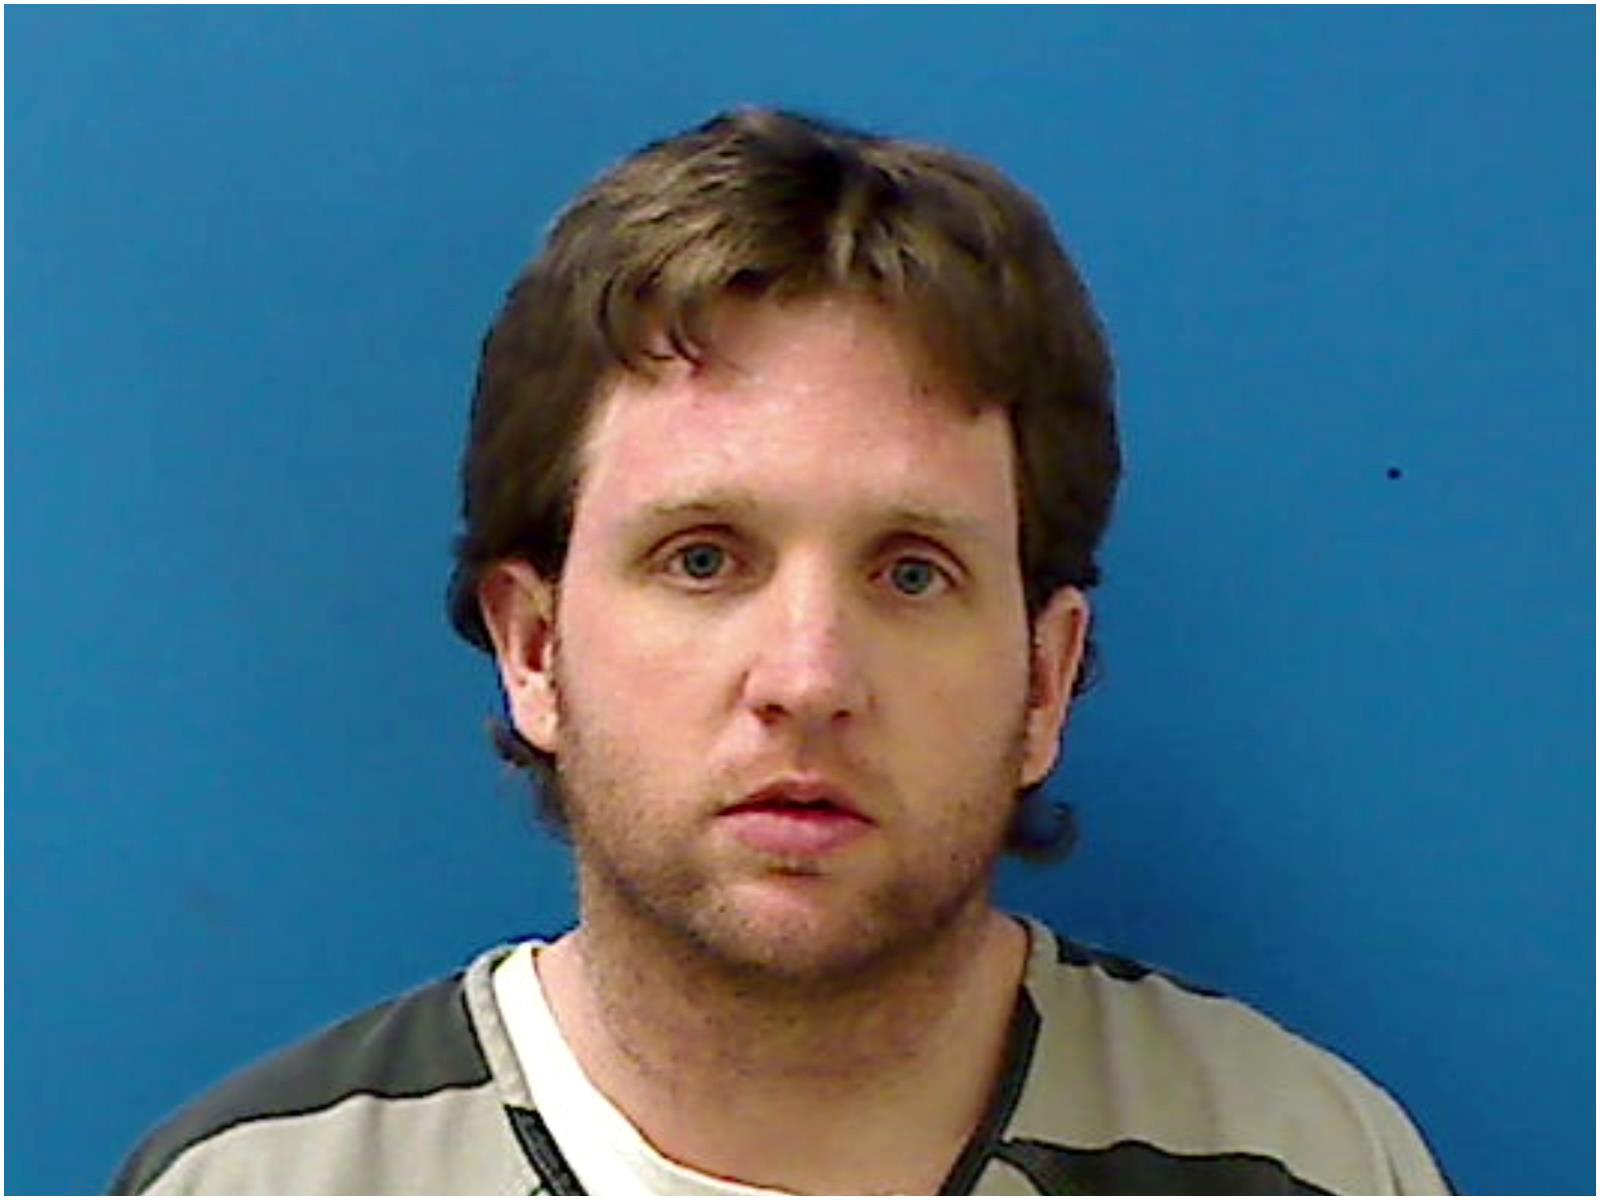 Defendant James Thacker